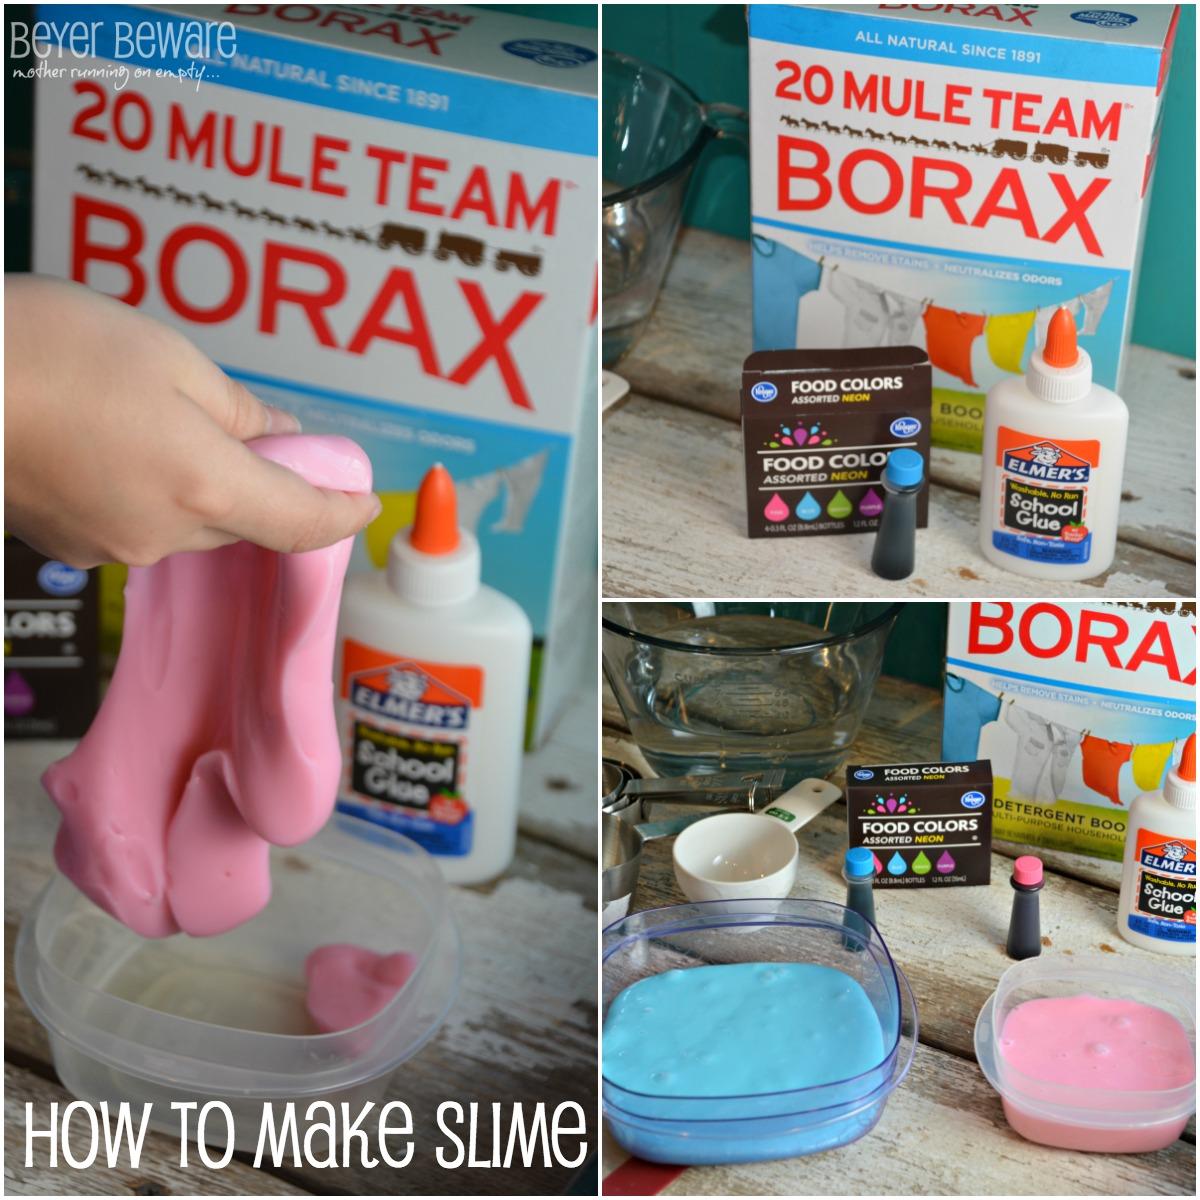 Making slime with Borax